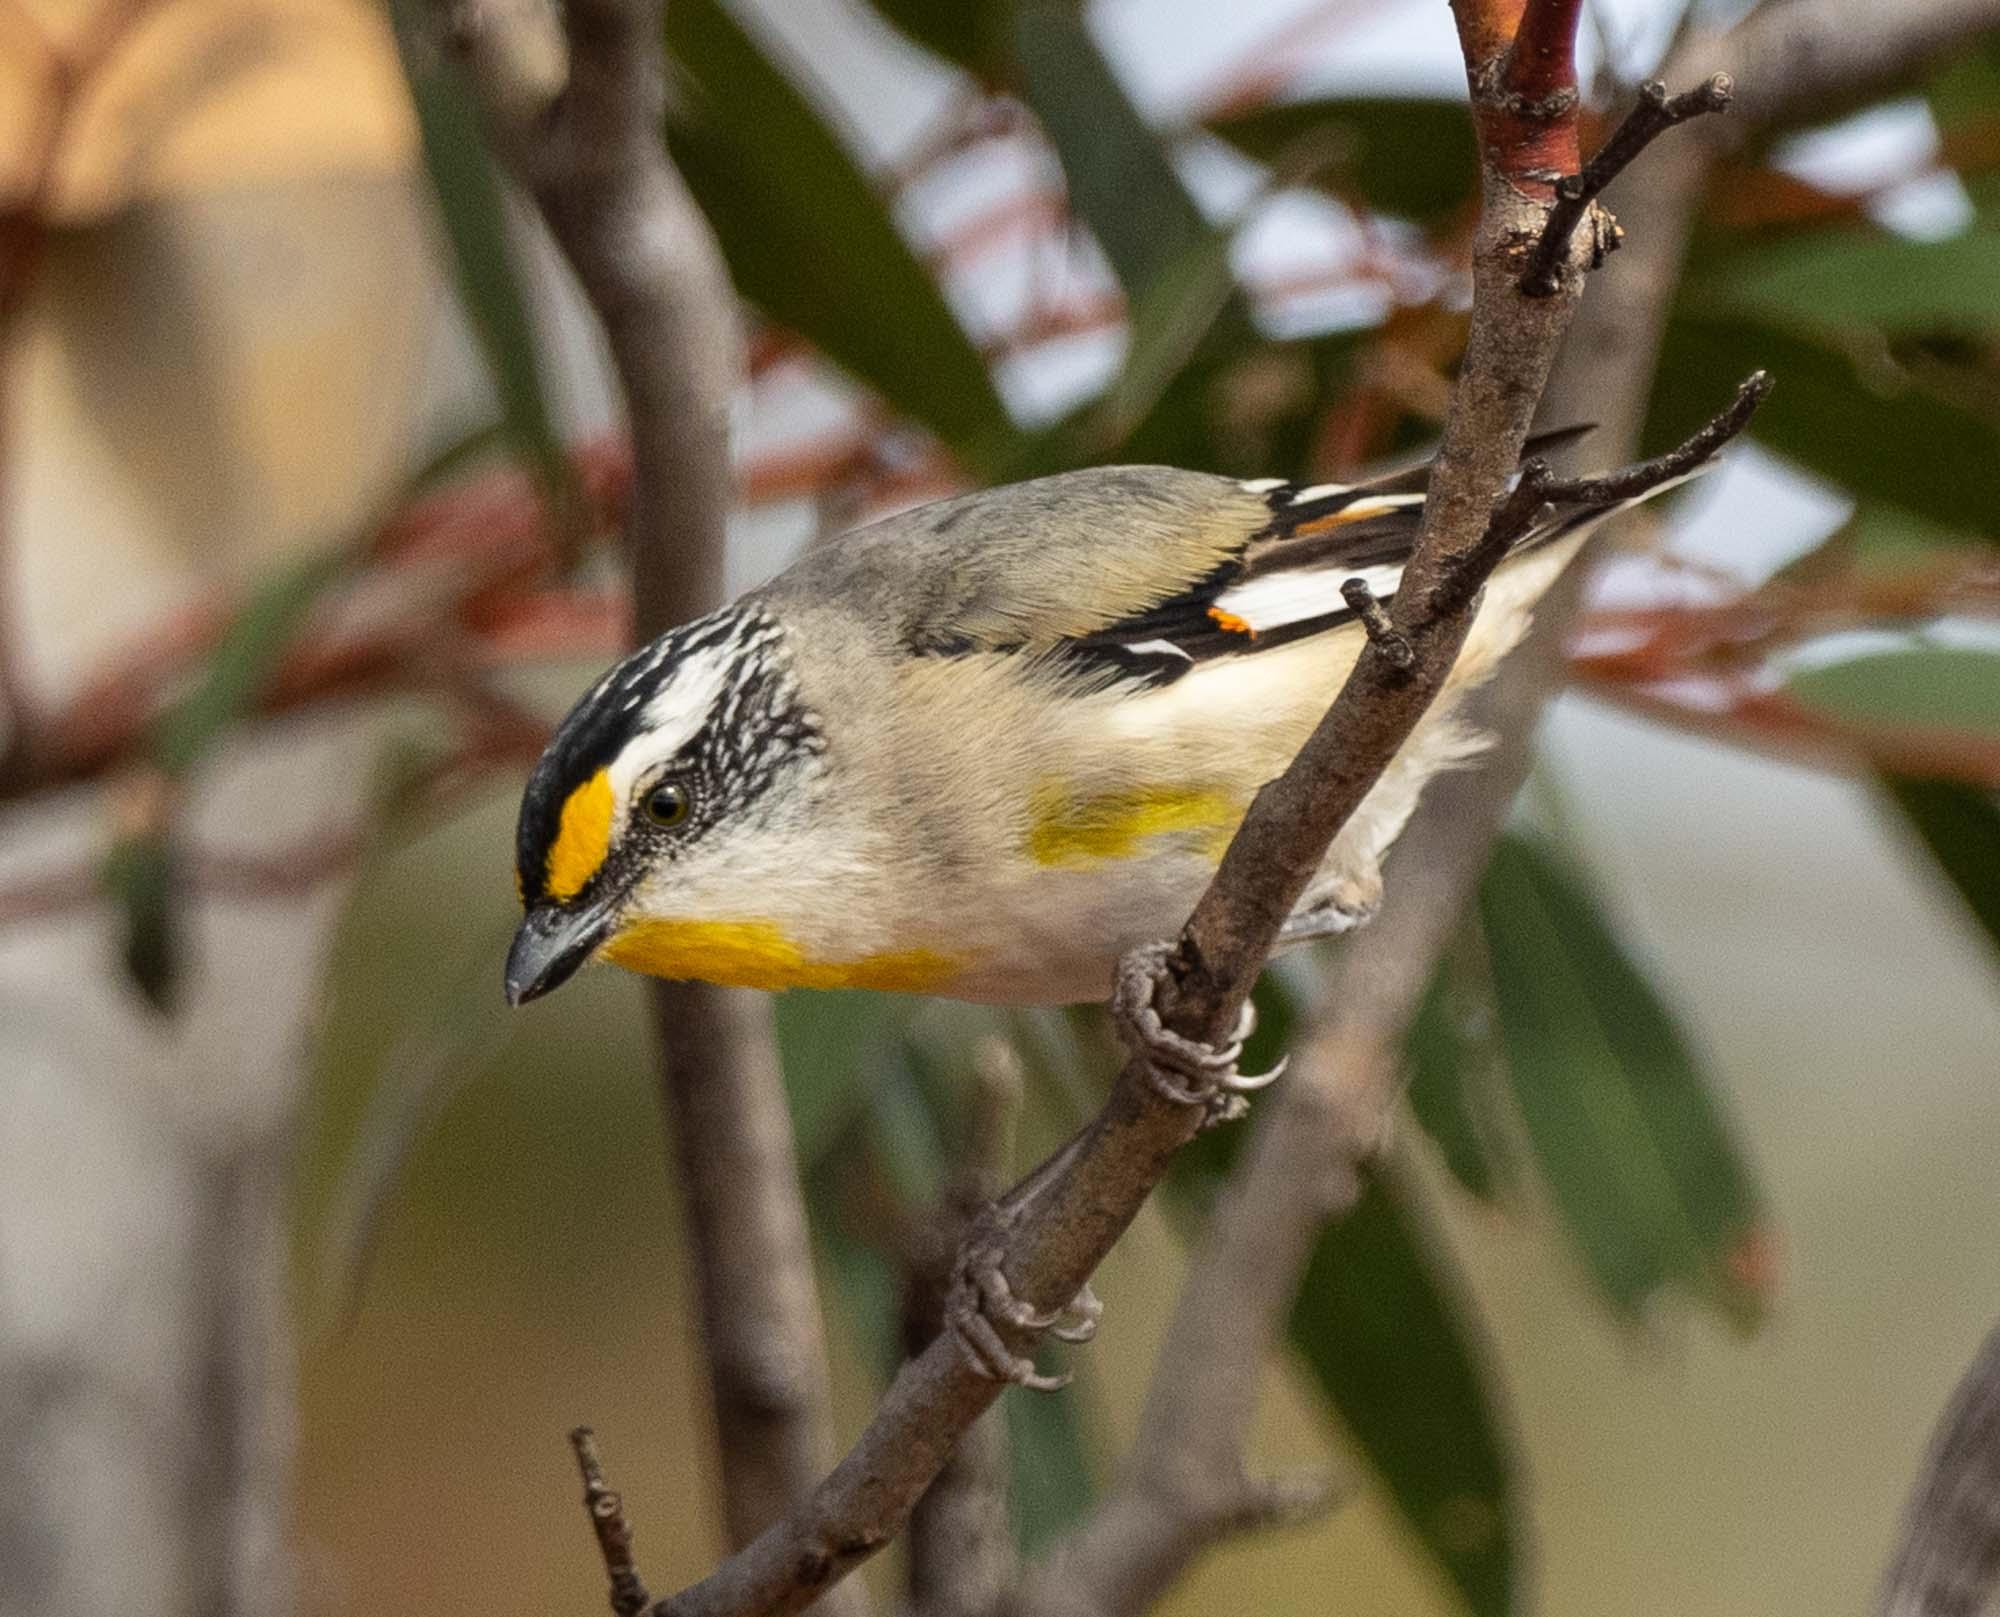 Striated Pardalote, nesting alongside the Tree Martins